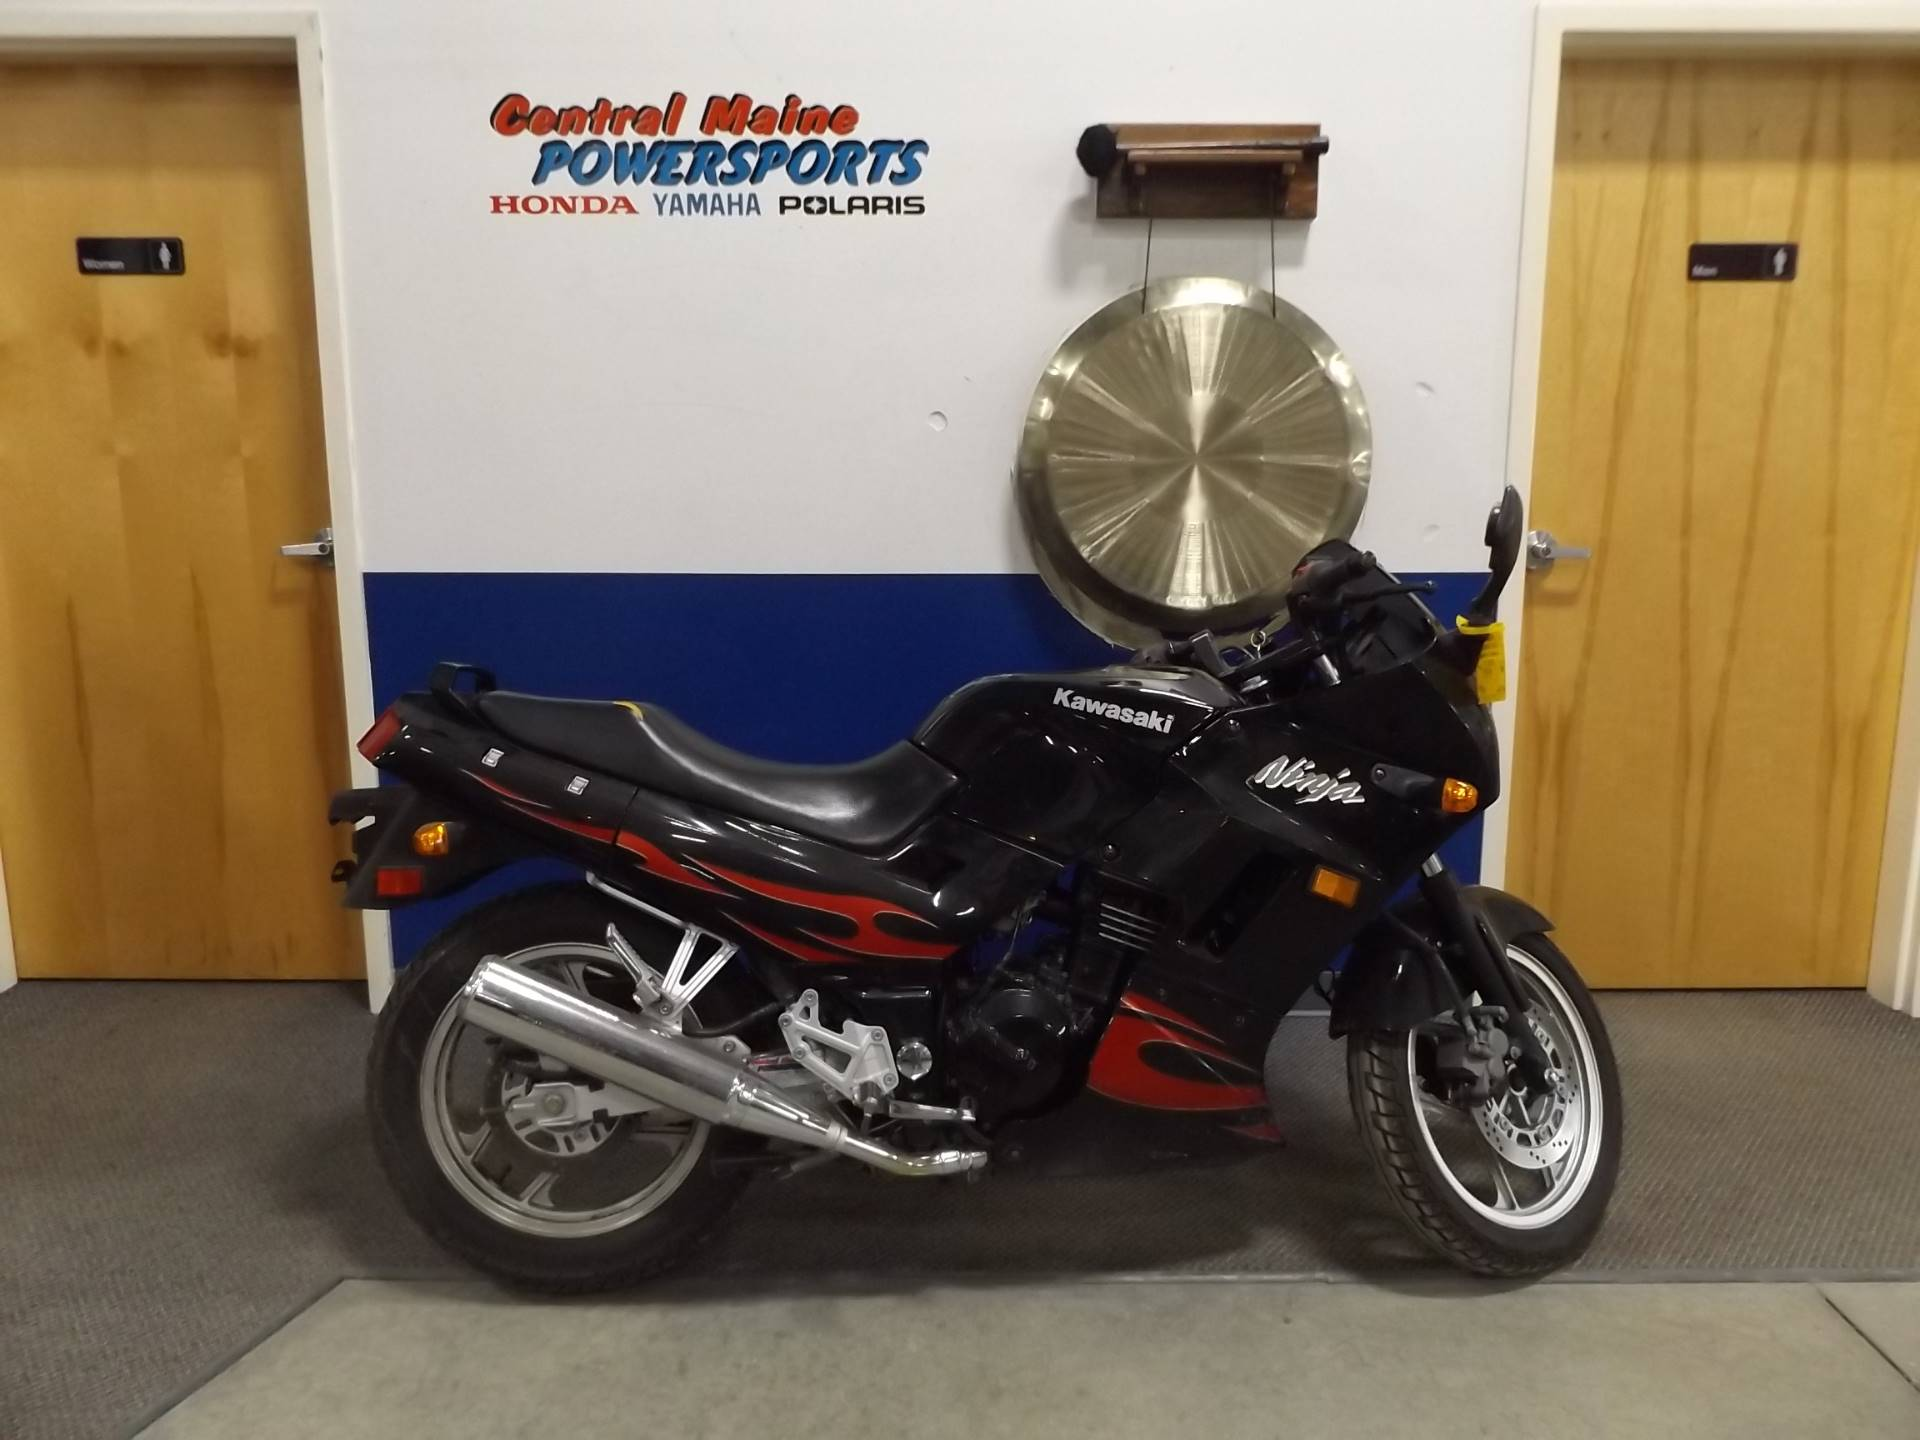 Used 2007 Kawasaki Ninja 250r Motorcycles In Lewiston Me Black